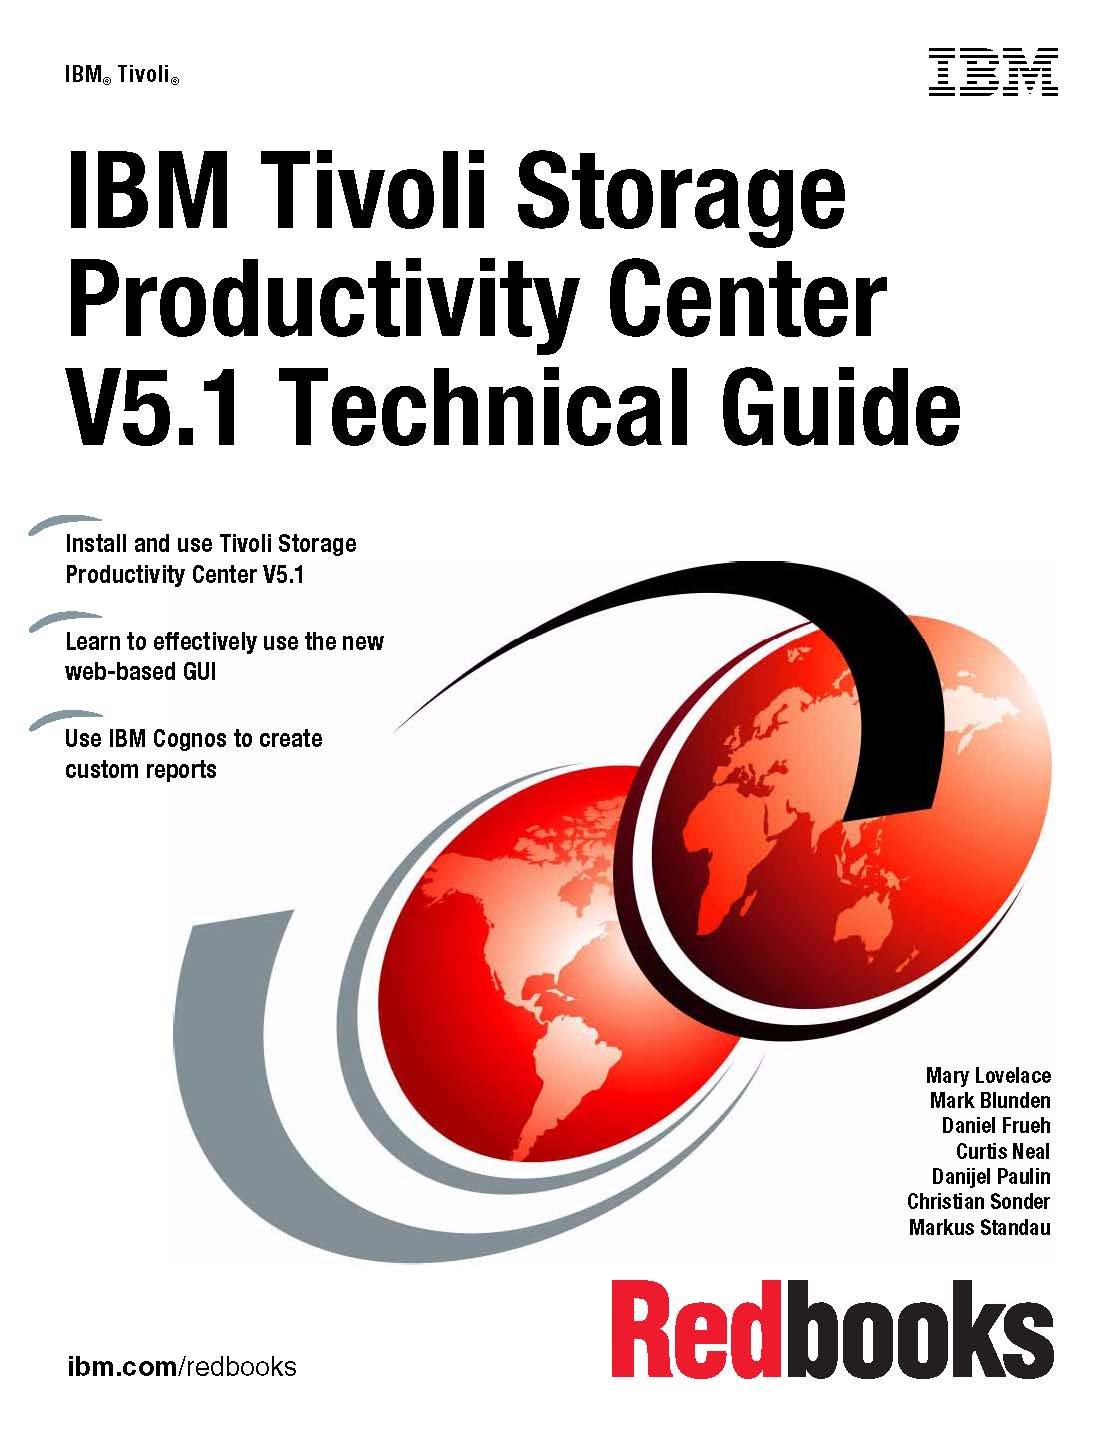 ibm tivoli storage productivity center v5 1 technical guide lovelace mary blunden mark frueh daniel neal curtis paulin danijel 9780738439143 amazon com books amazon com